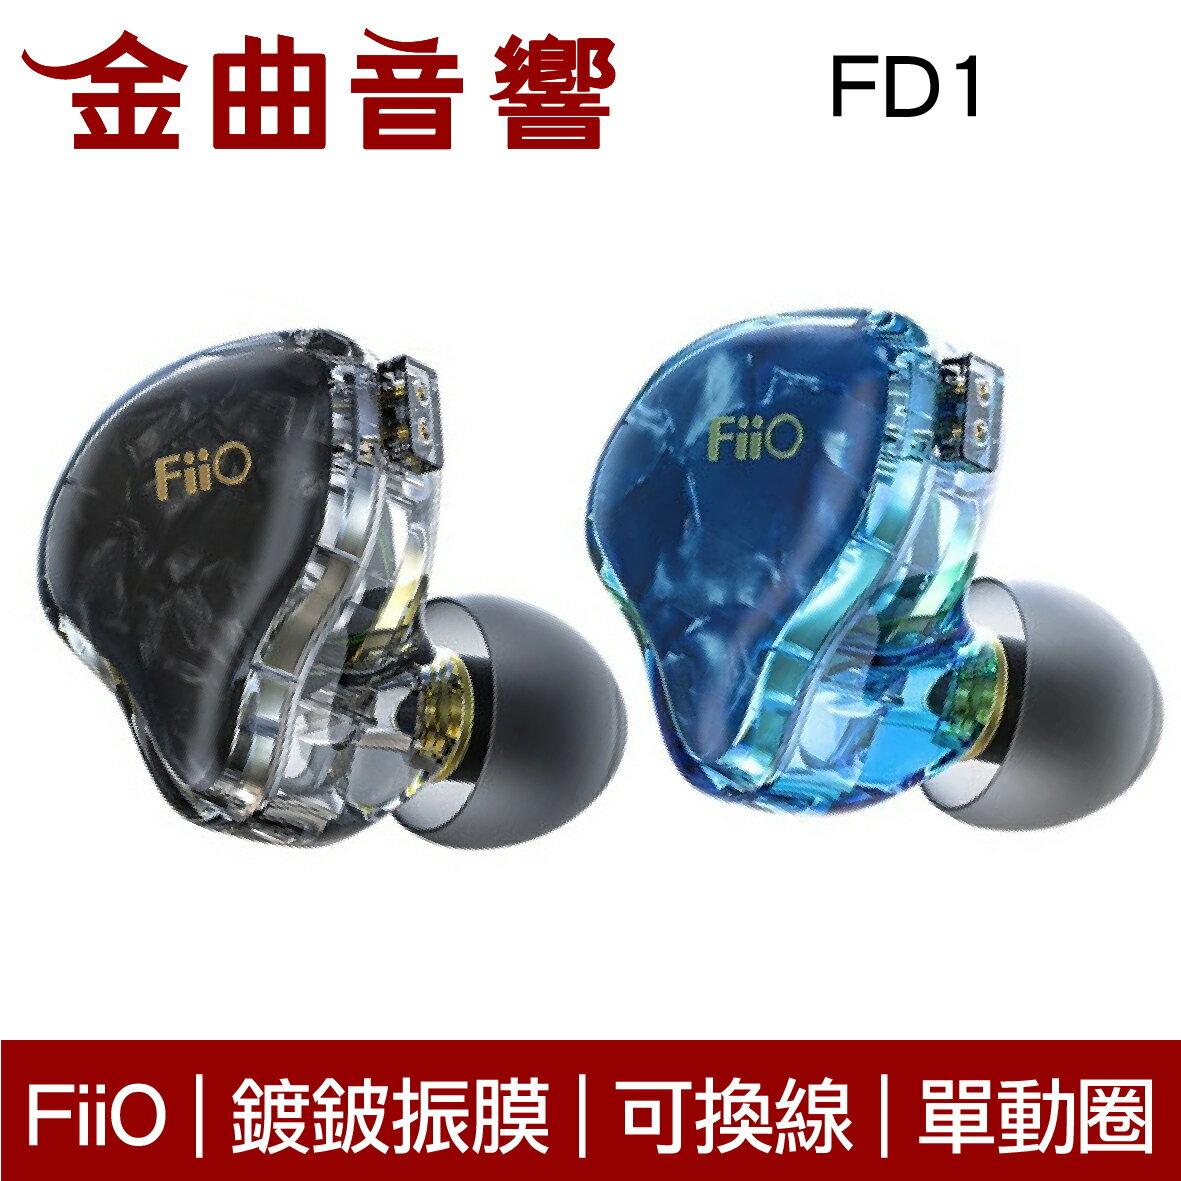 FiiO FD1 黑 鍍鈹振膜 單動圈 CIEM 可換線 耳道式 耳機 | 金曲音響